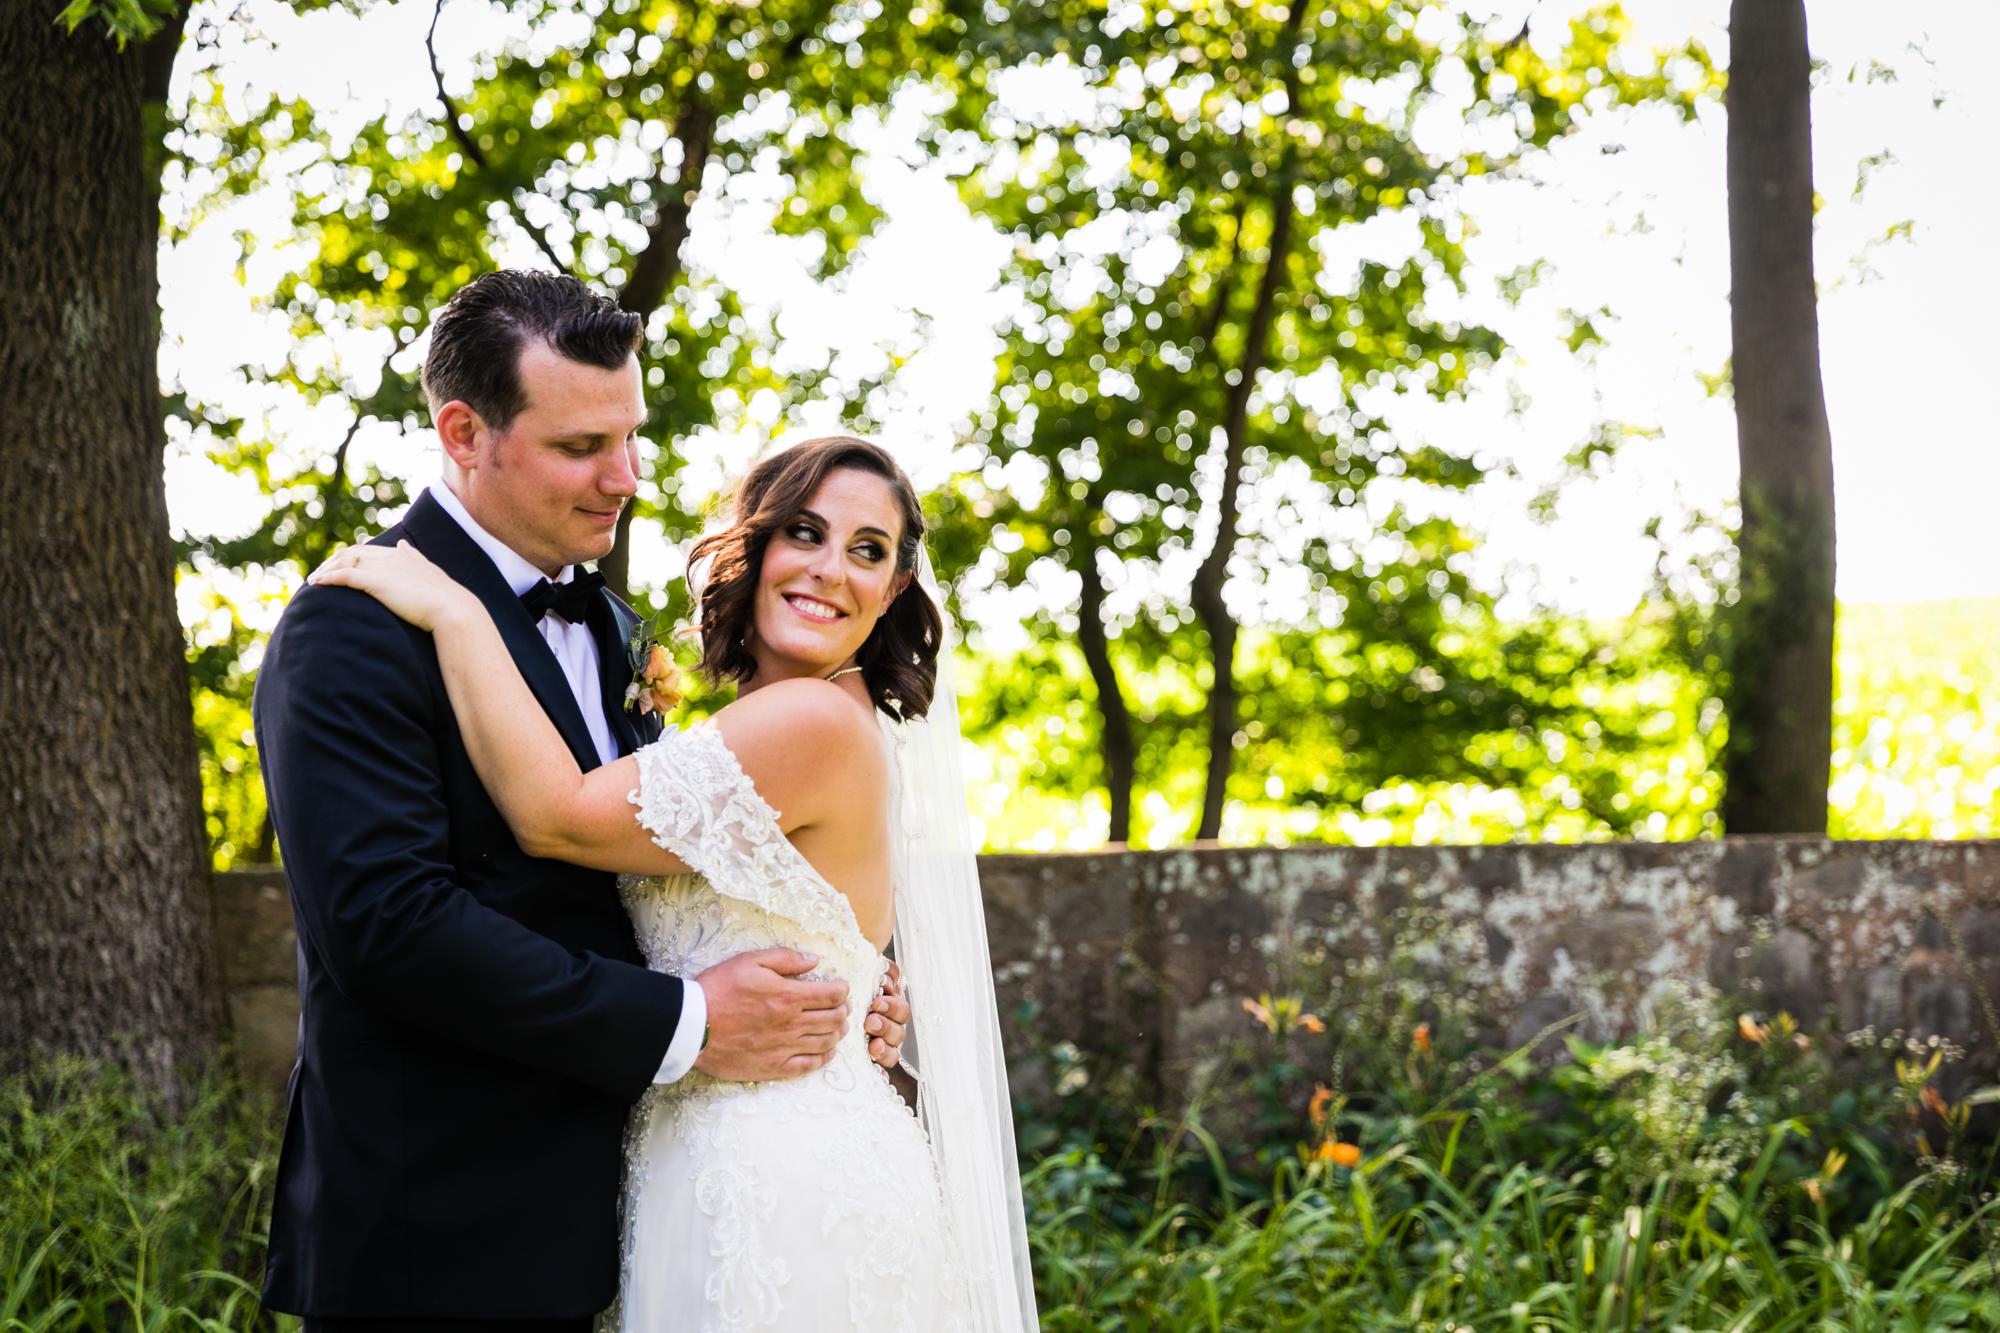 Hotel Du Village - LoveStruck Pictures - Wedding Photography-029.jpg